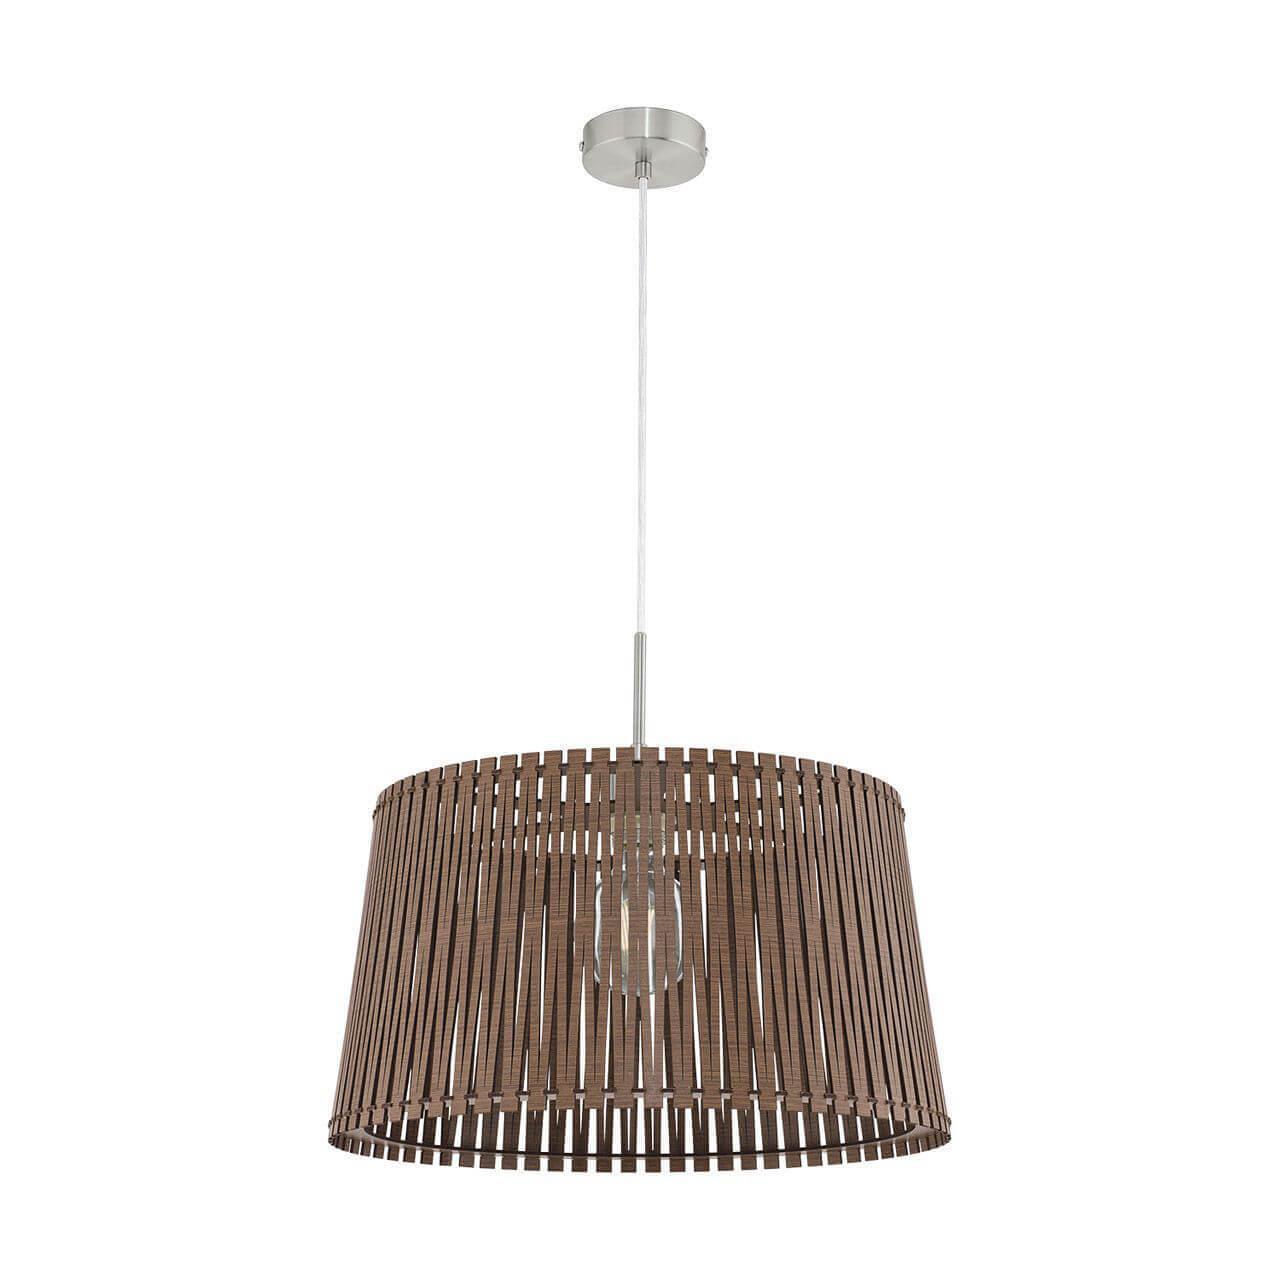 Подвесной светильник Eglo Sendero 96199 цены онлайн